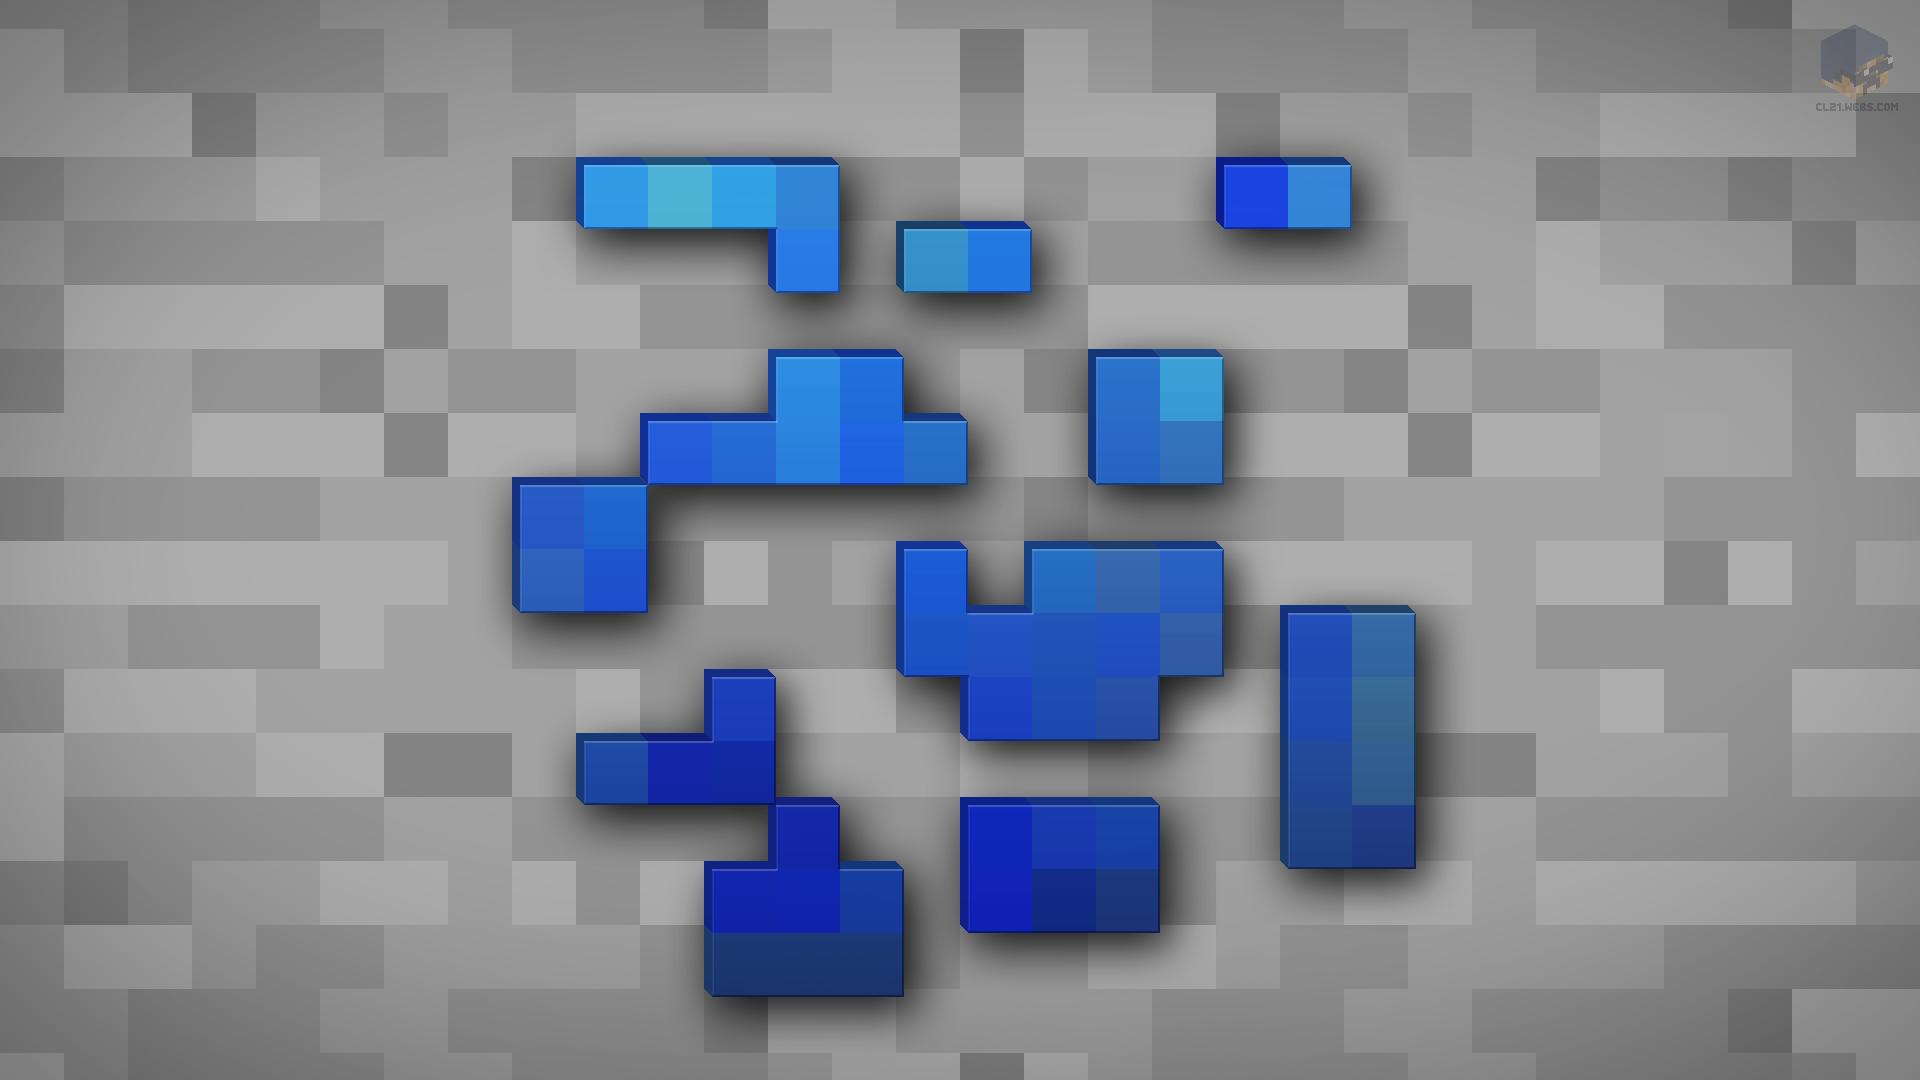 Minecraft shaded lapis lazuli ore wallpaper by chrisl21 on Block wallpaper